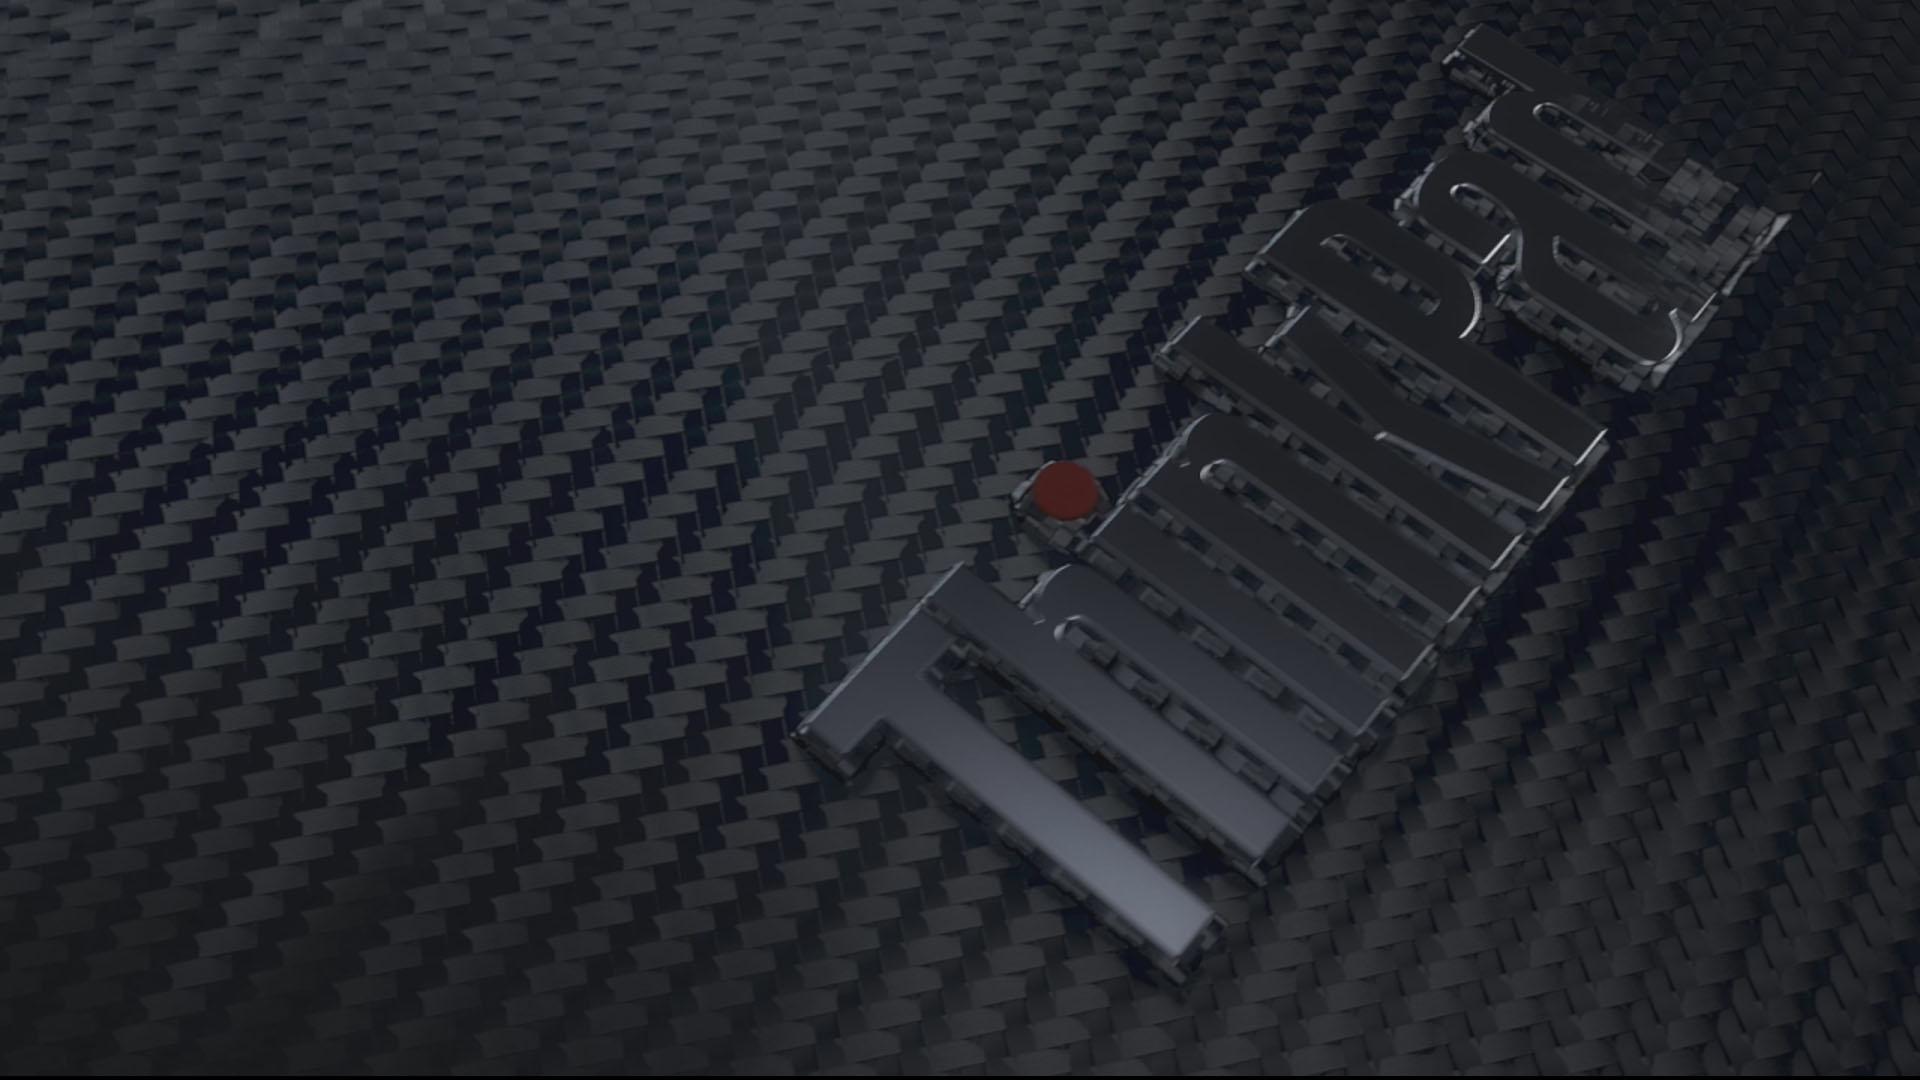 Lenovo Wallpaper Car: X1 Carbon Wallpaper